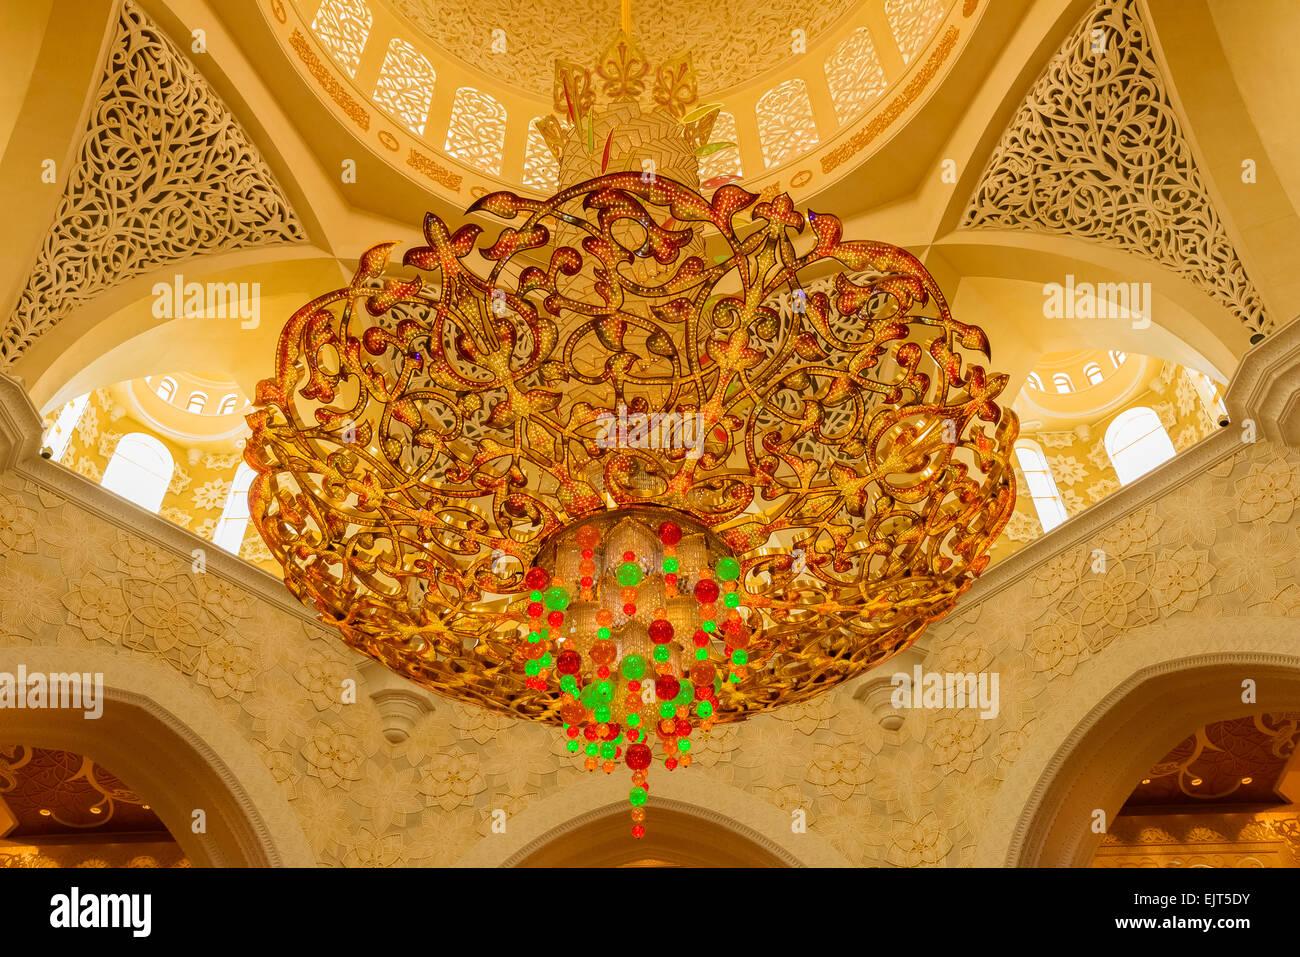 Chandelier in Sheikh Zayad Grand Mosque in Abu Dhabi, UAE Stock ...